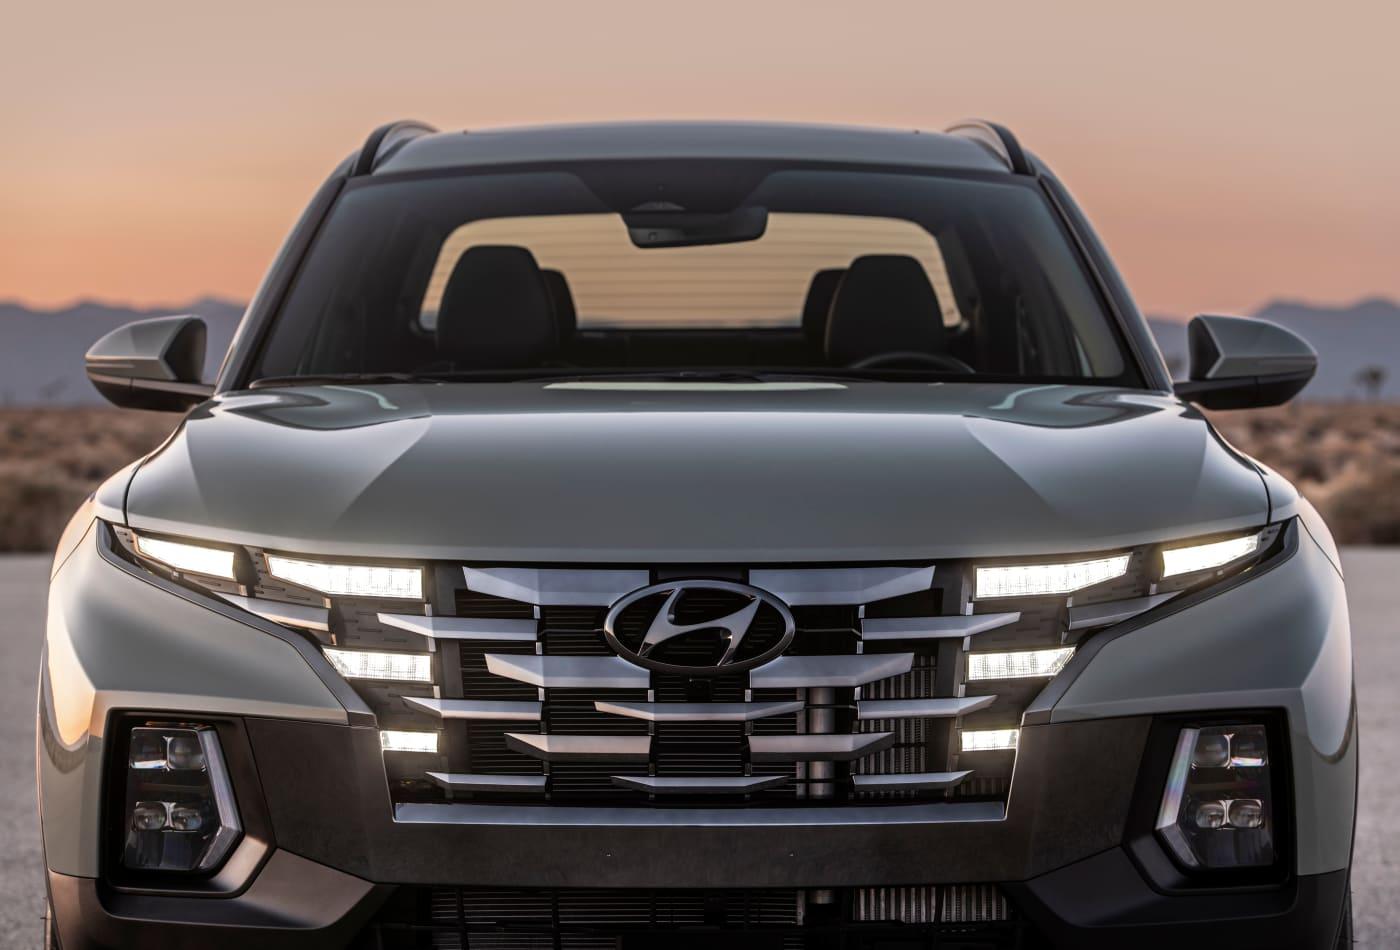 Hyundai enters U.S. pickup market with new Santa Cruz 'Sport Adventure Vehicle'